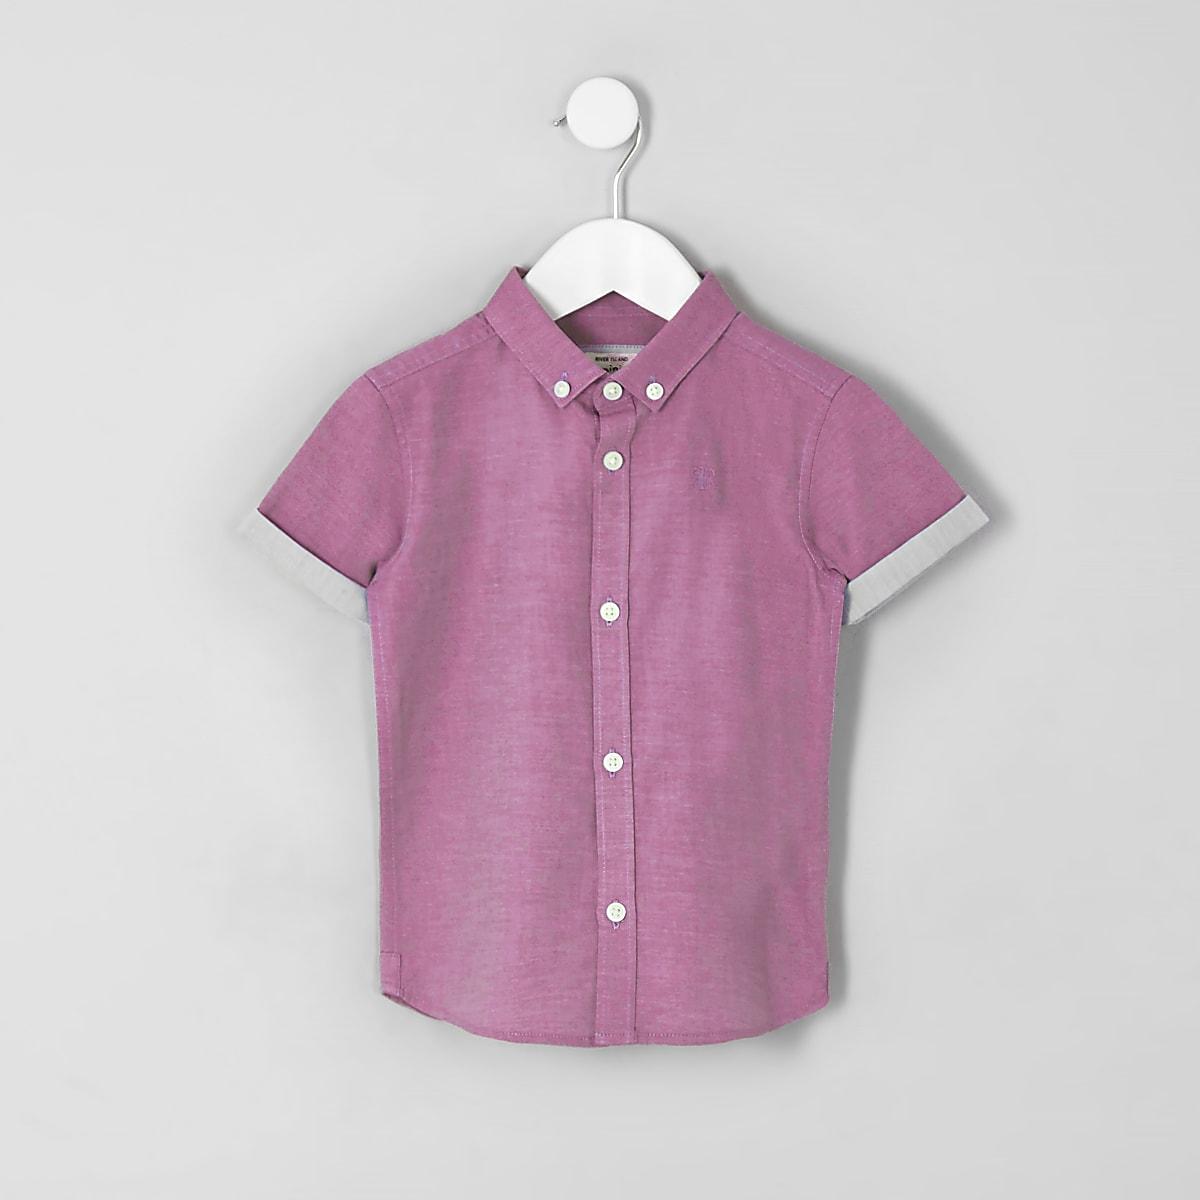 Chemise RI rose à manches courtes mini garçon